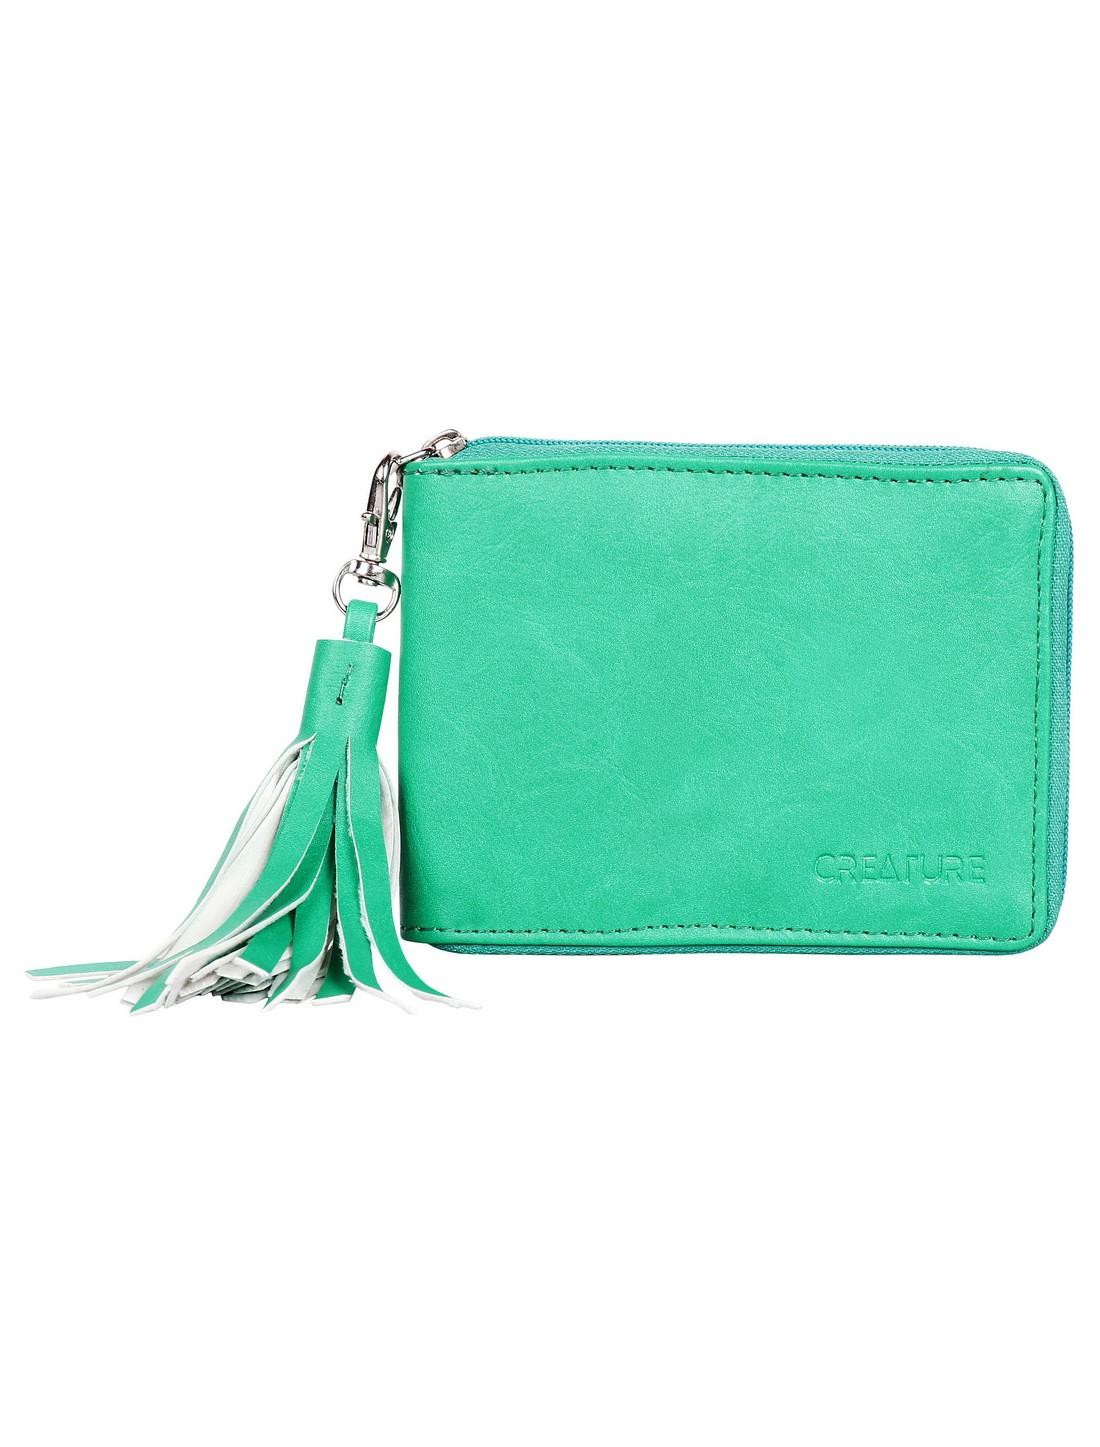 CREATURE   Creature Green PU Leather Zipper Wallet for Women